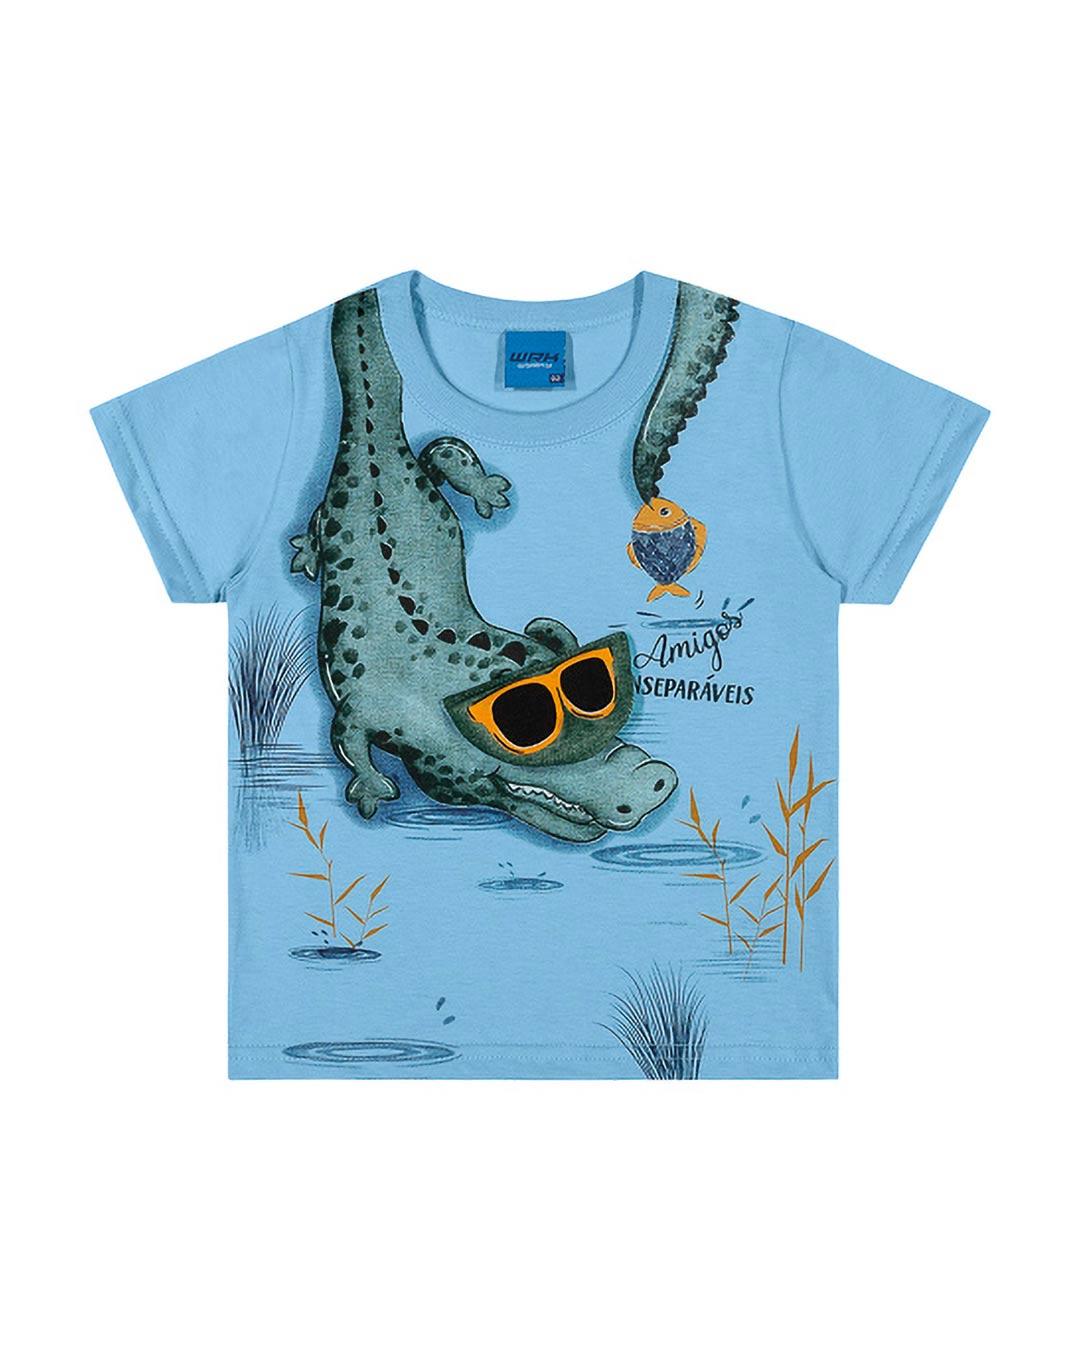 Camiseta Infantil Amigos Inseparáveis - WRK